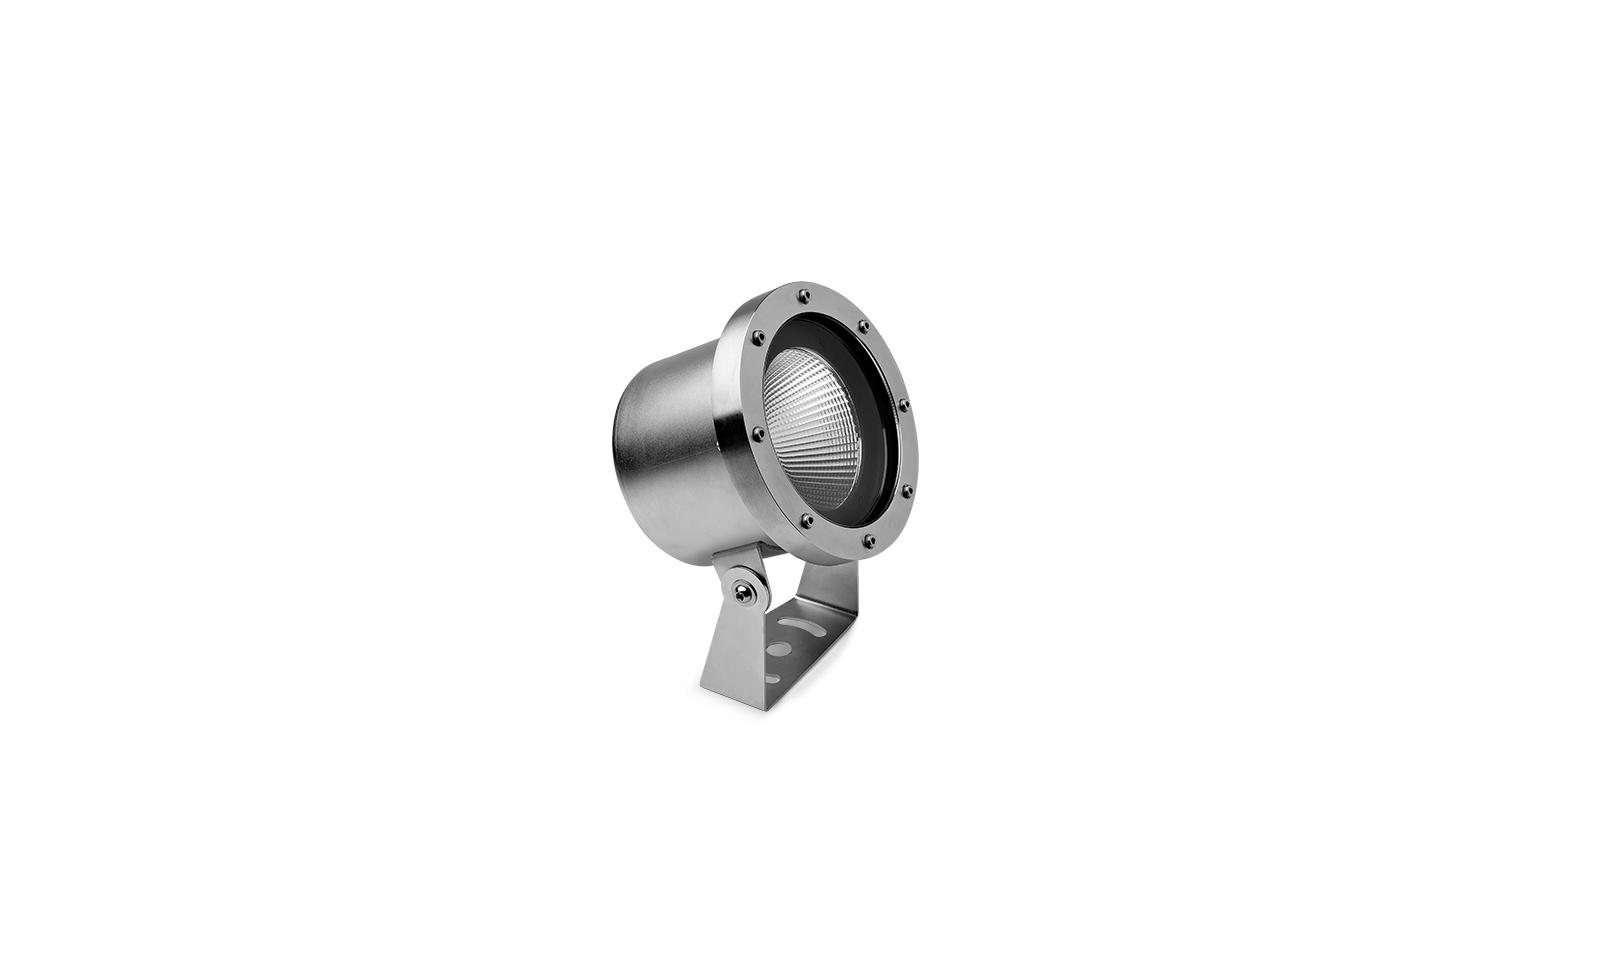 305003 DIVE MAXI LED 20W 1